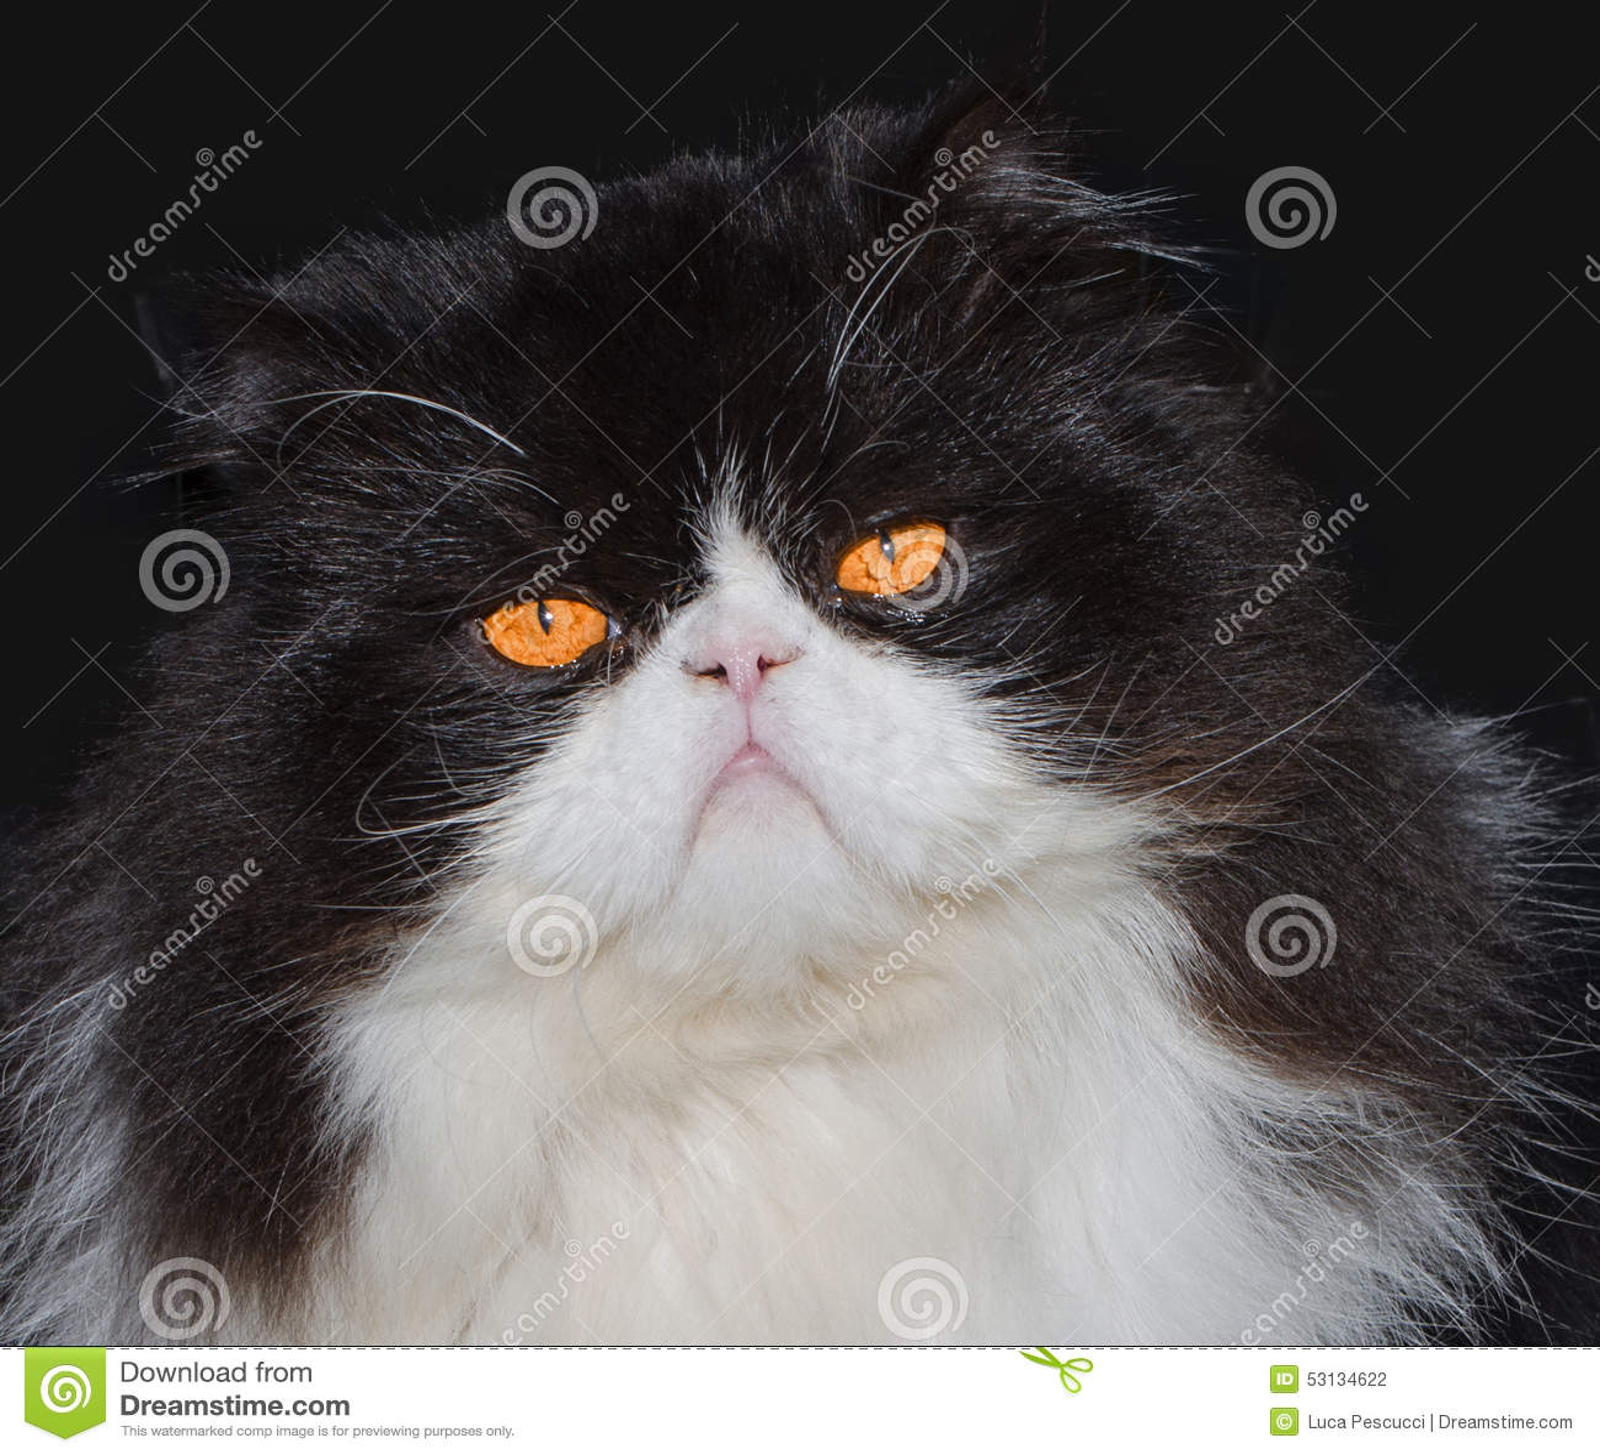 Portrait Black And White Persian Cat Stock Image